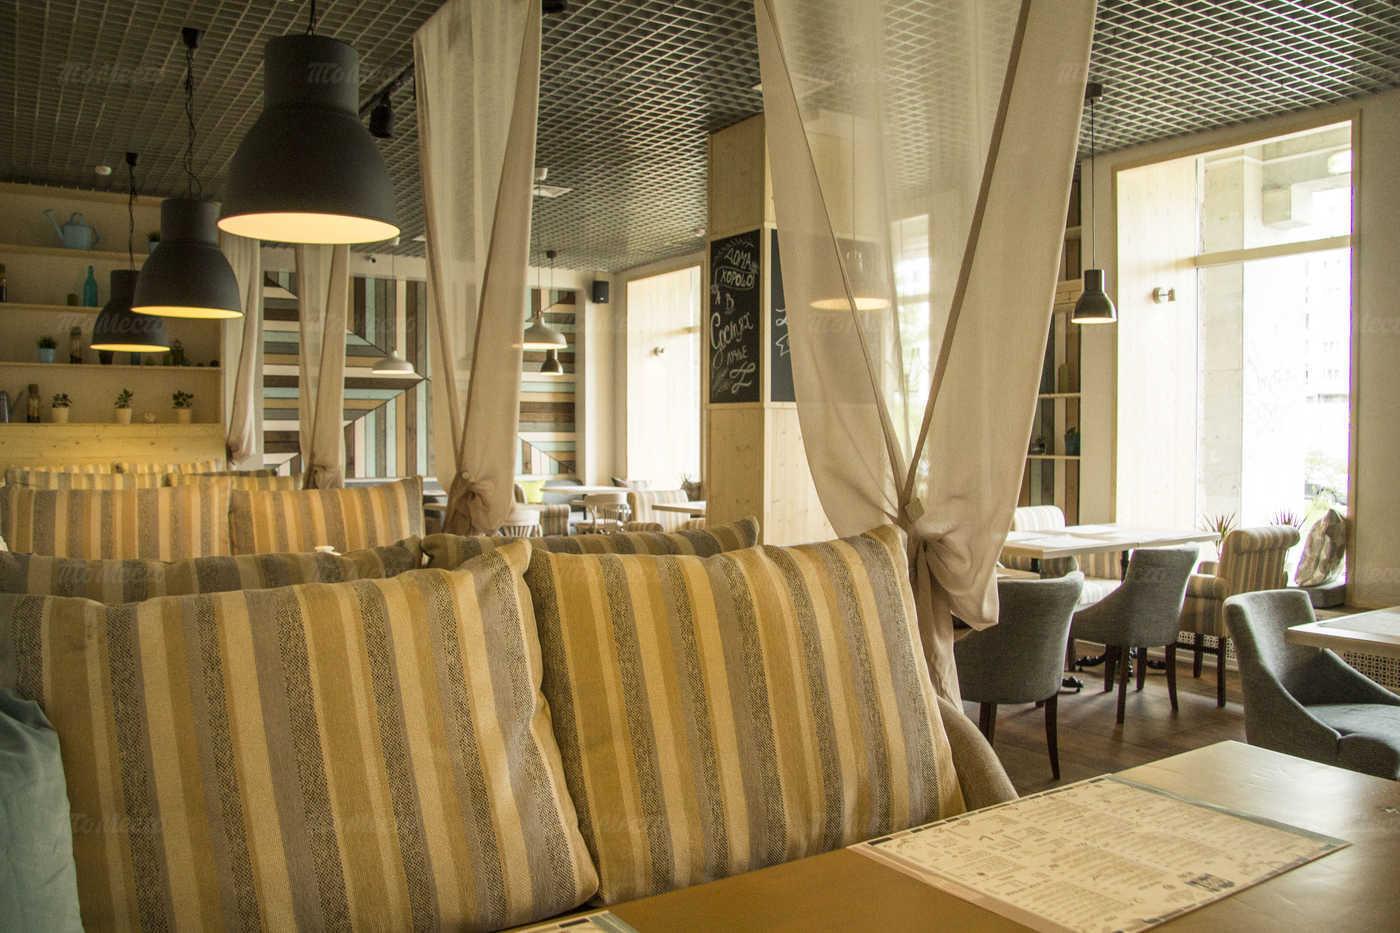 Меню ресторана Гости (Gости) на Богатырском проспекте